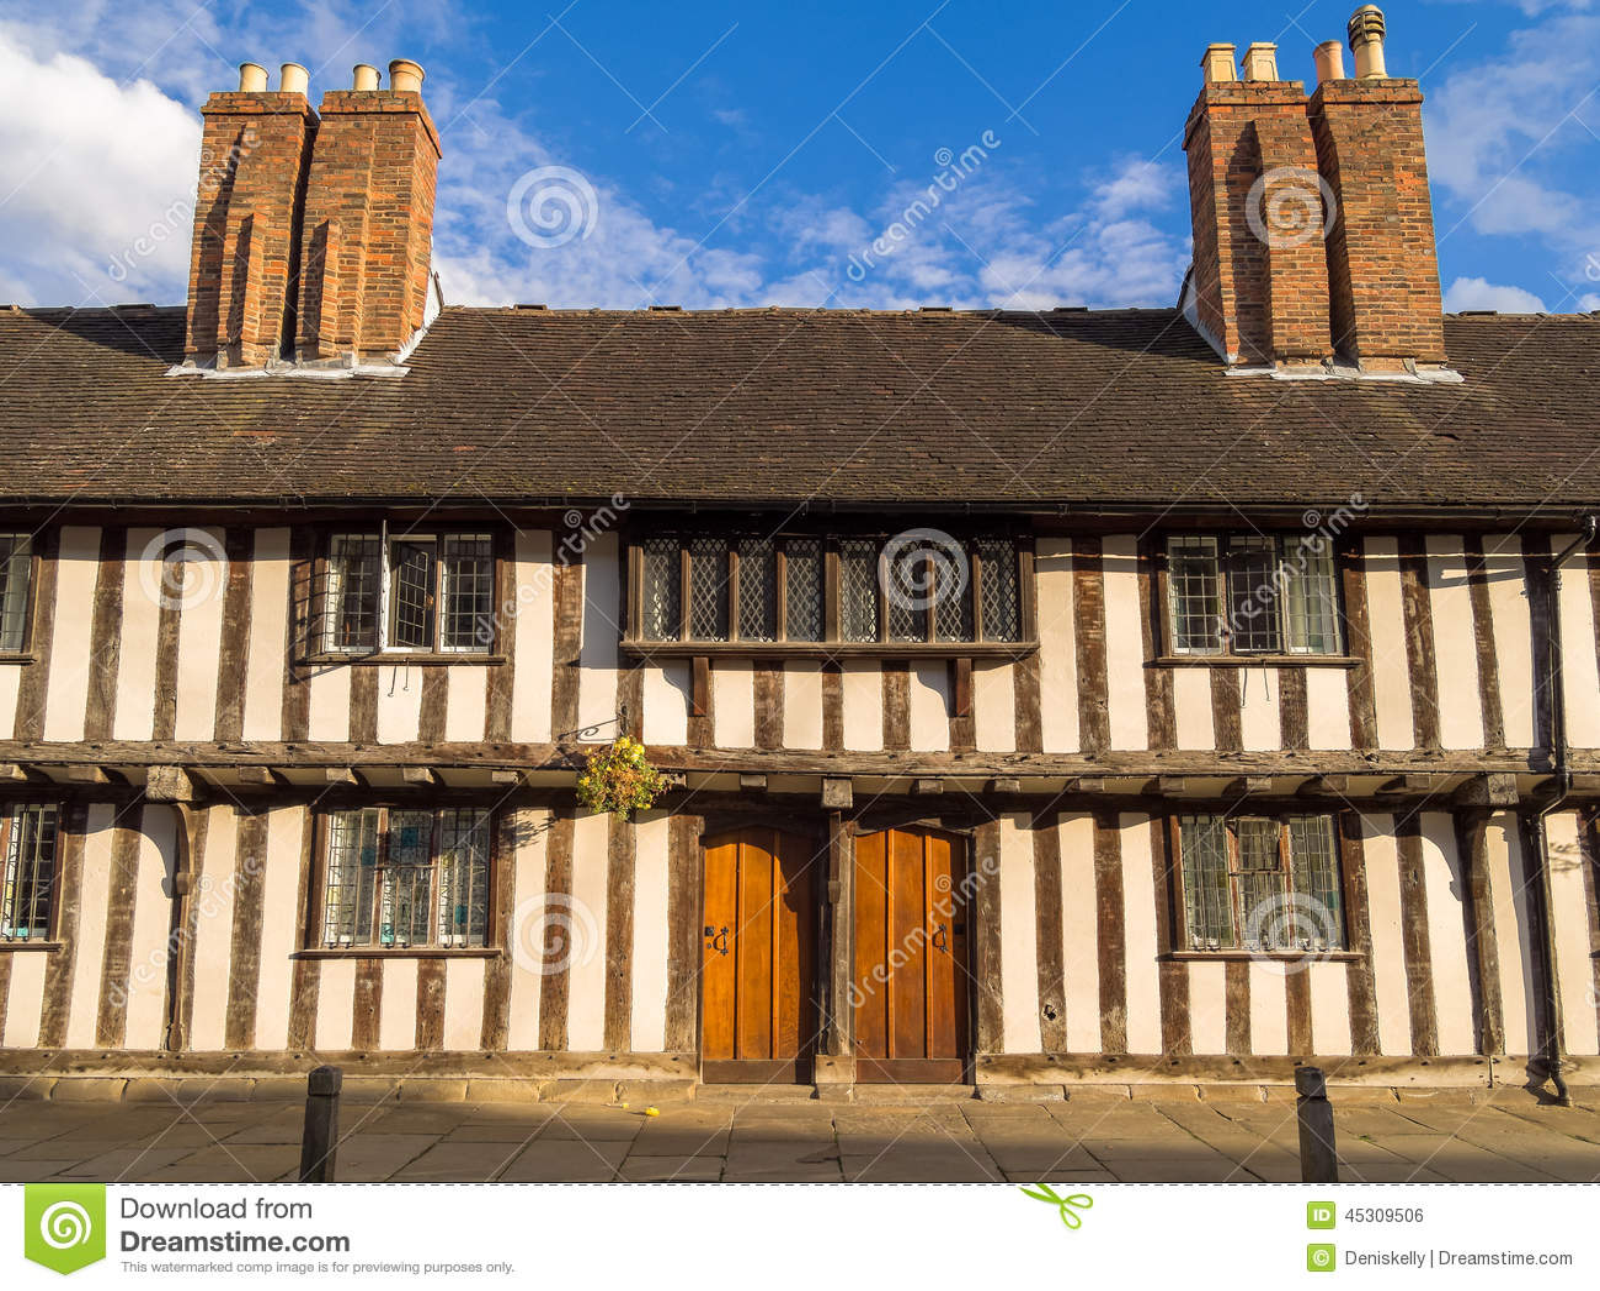 Historic Houses in Stratford on Avon